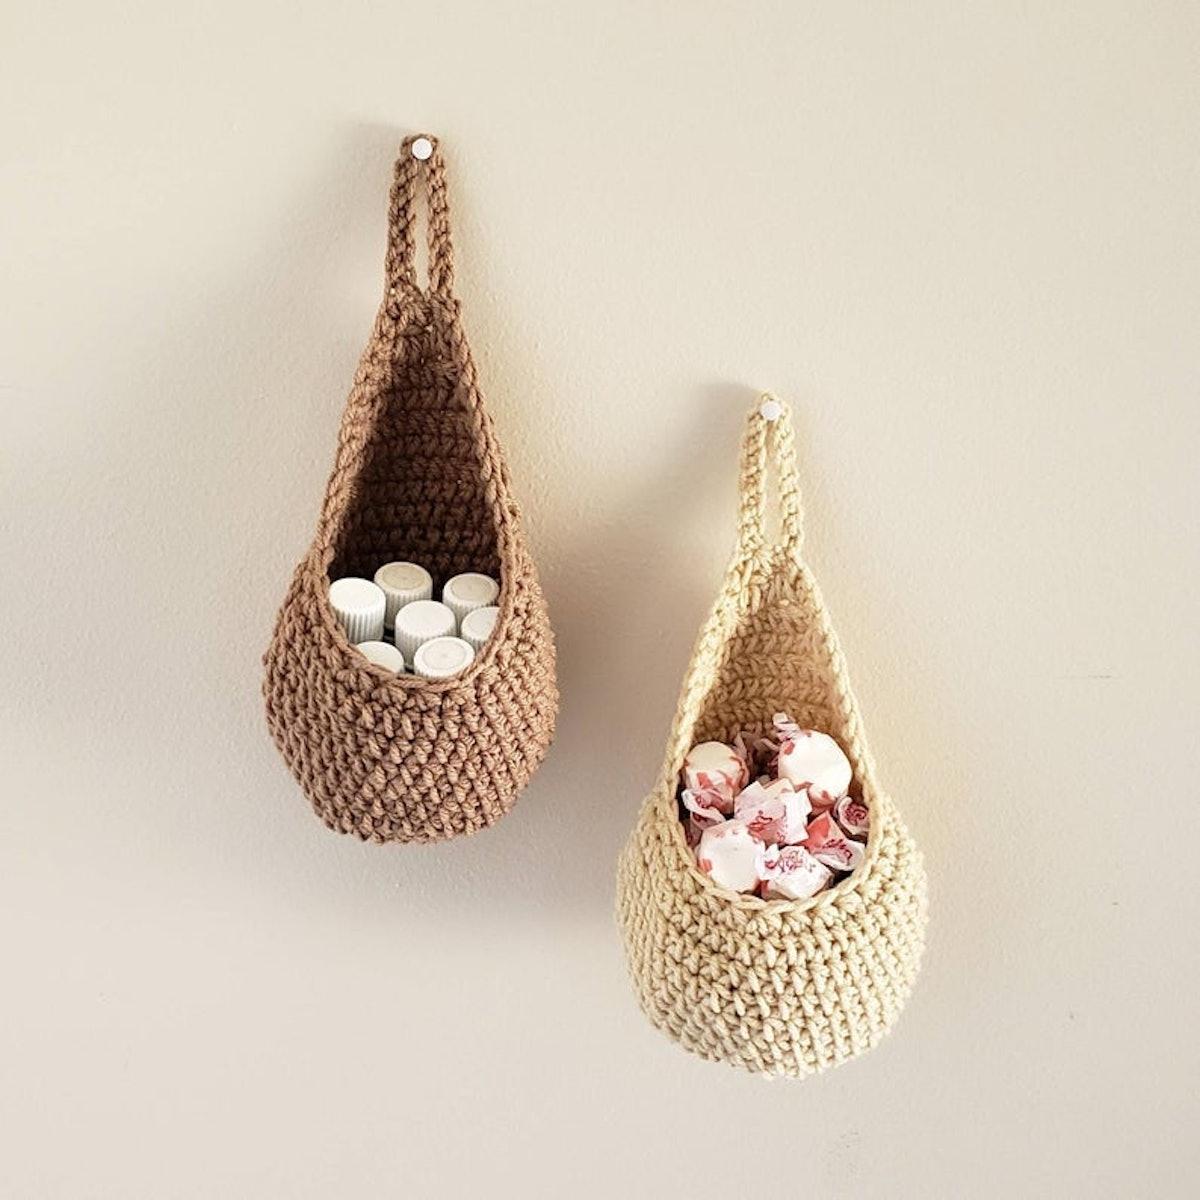 Crochet Hanging Baskets